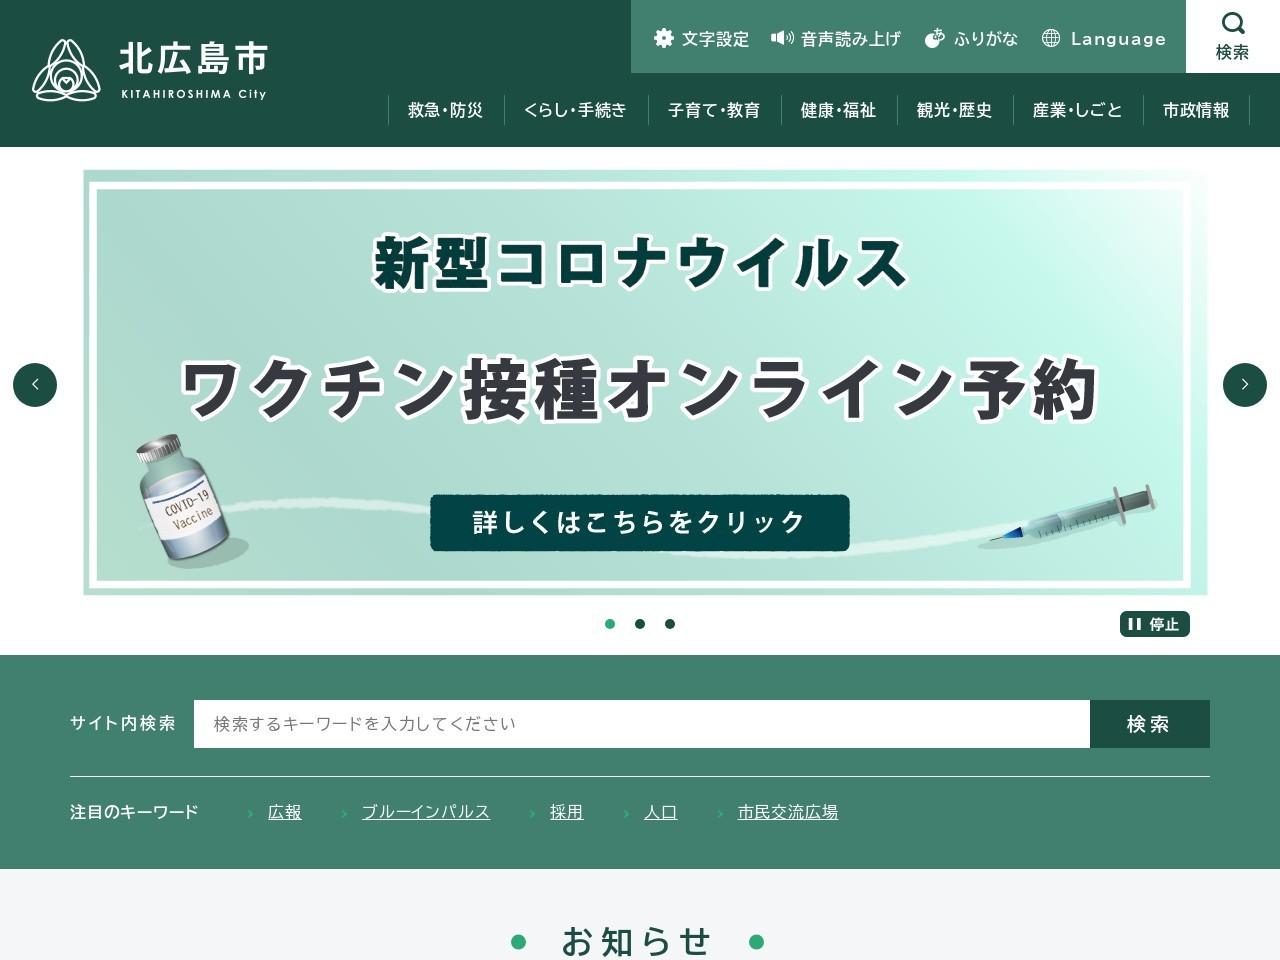 http://www.city.kitahiroshima.hokkaido.jp/hotnews/detail/00010103.html